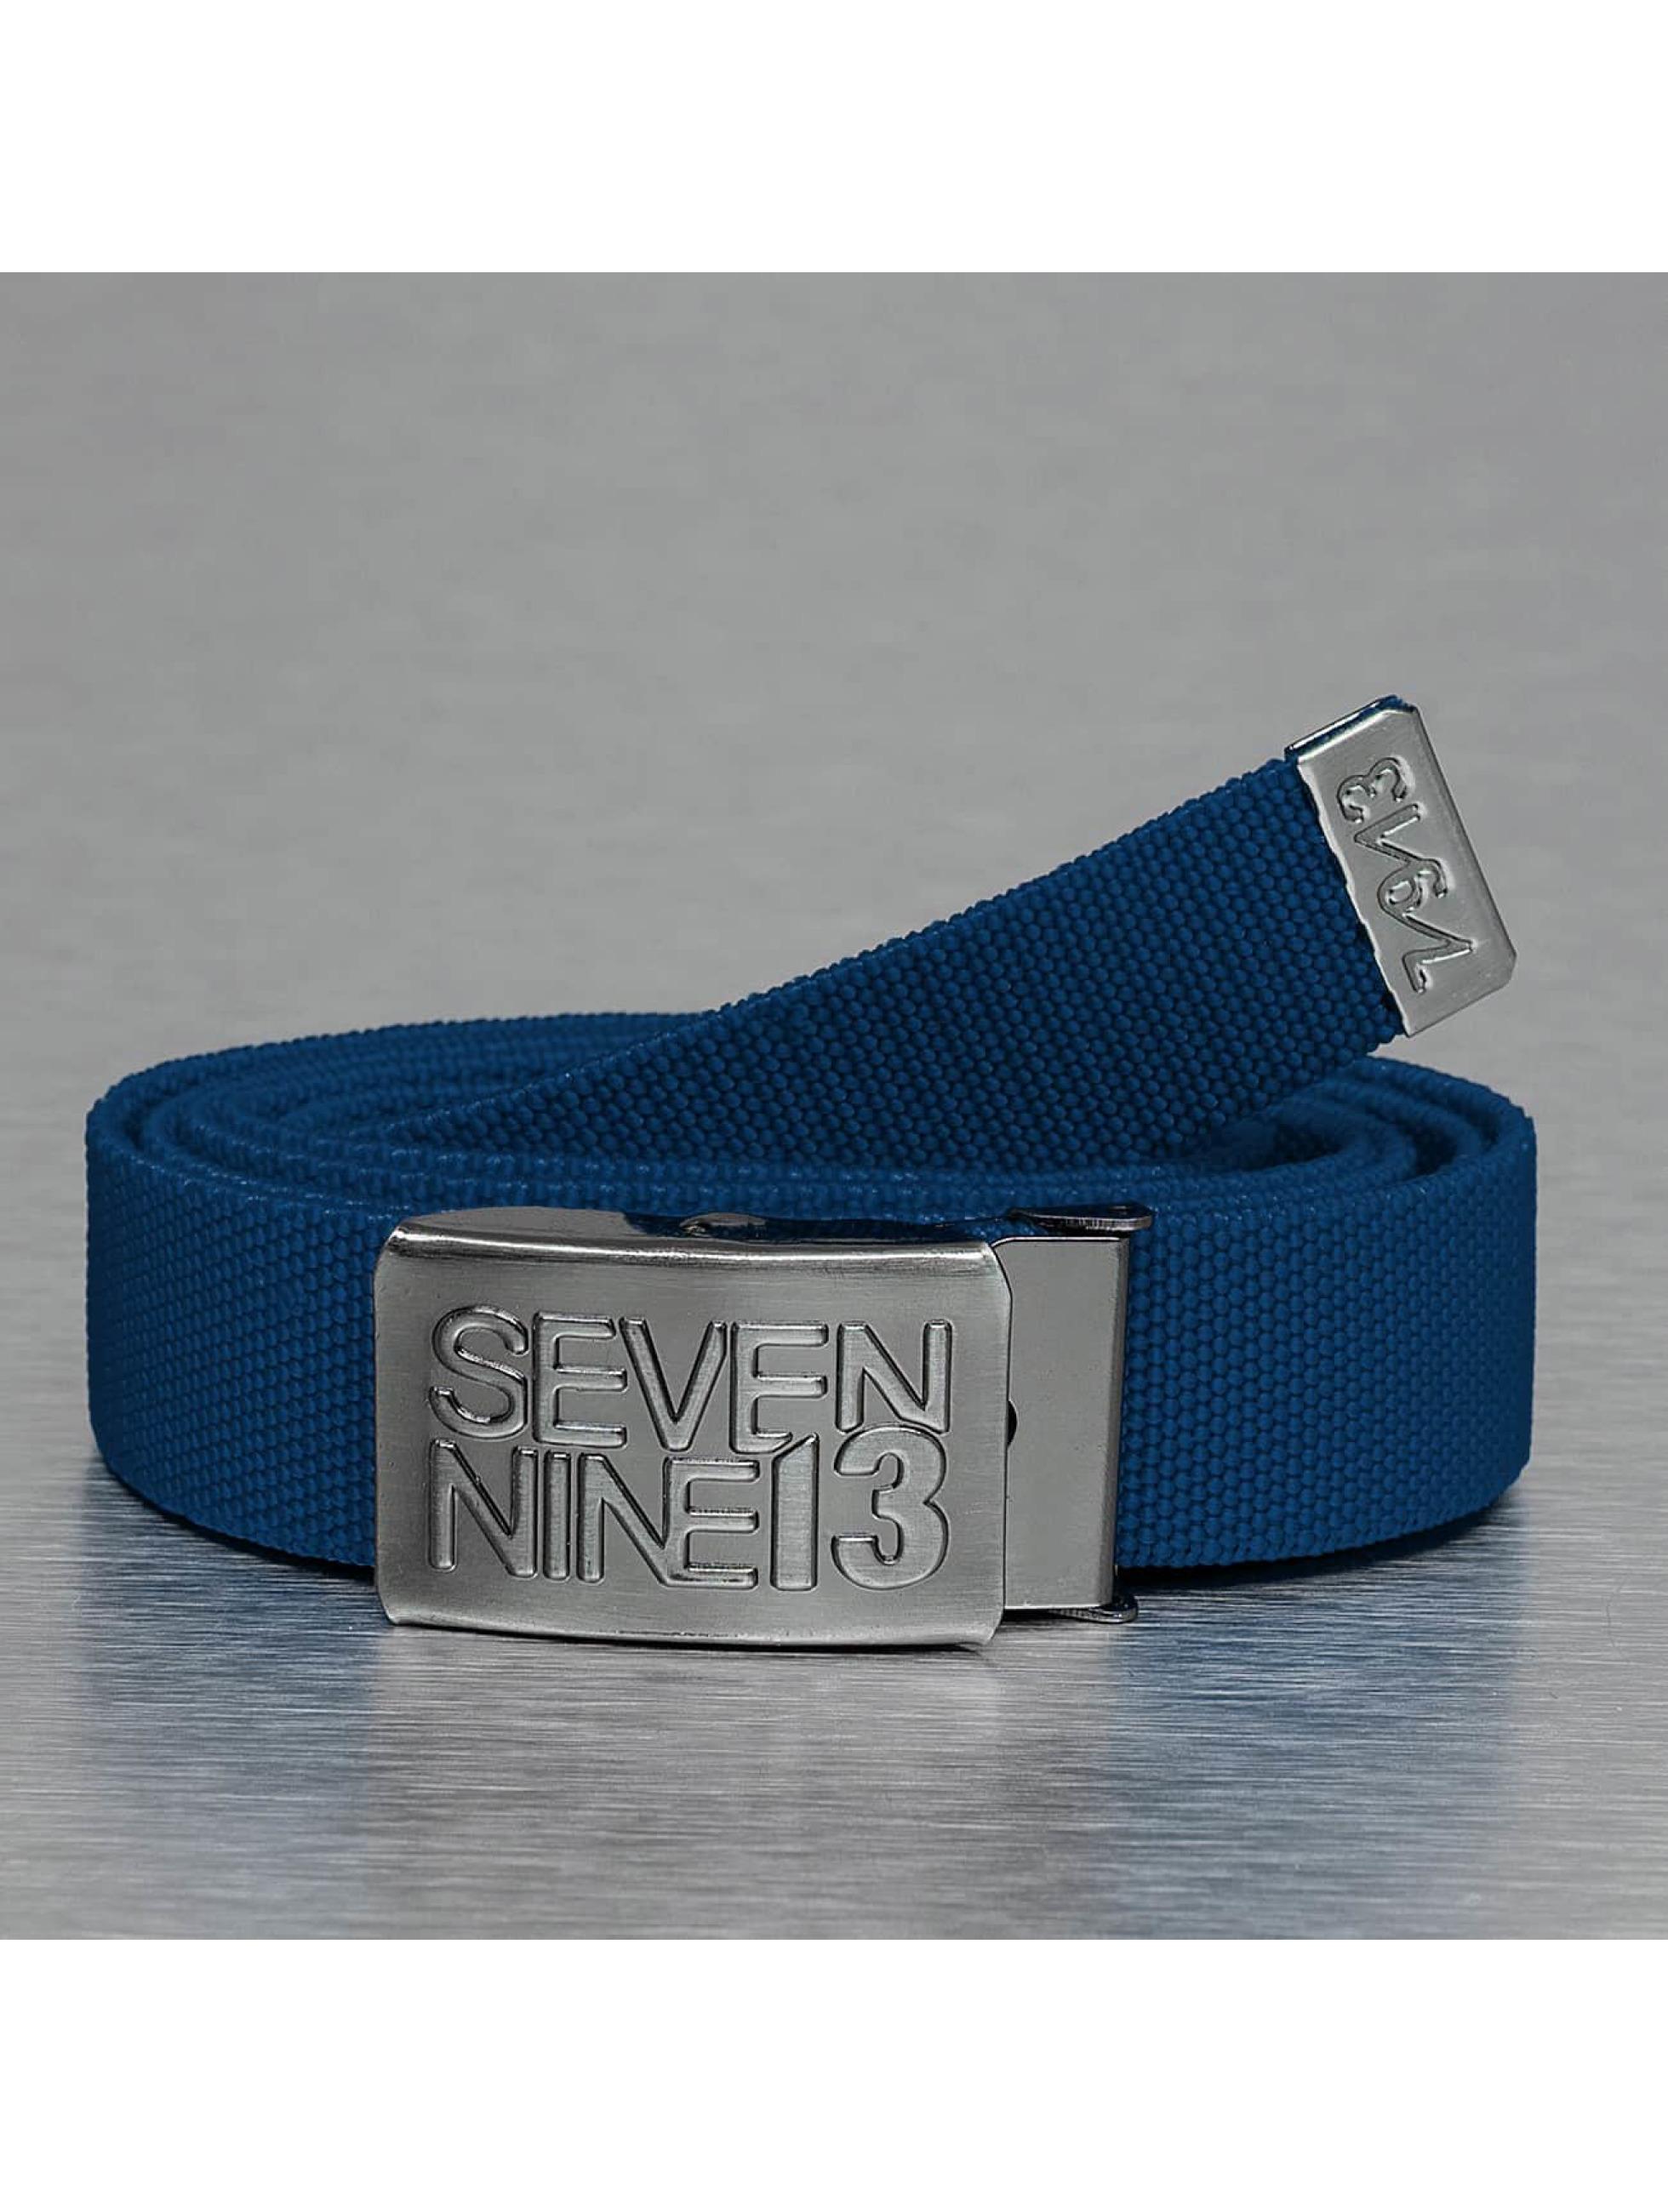 Seven Nine 13 Cintura Jaws Stretc blu